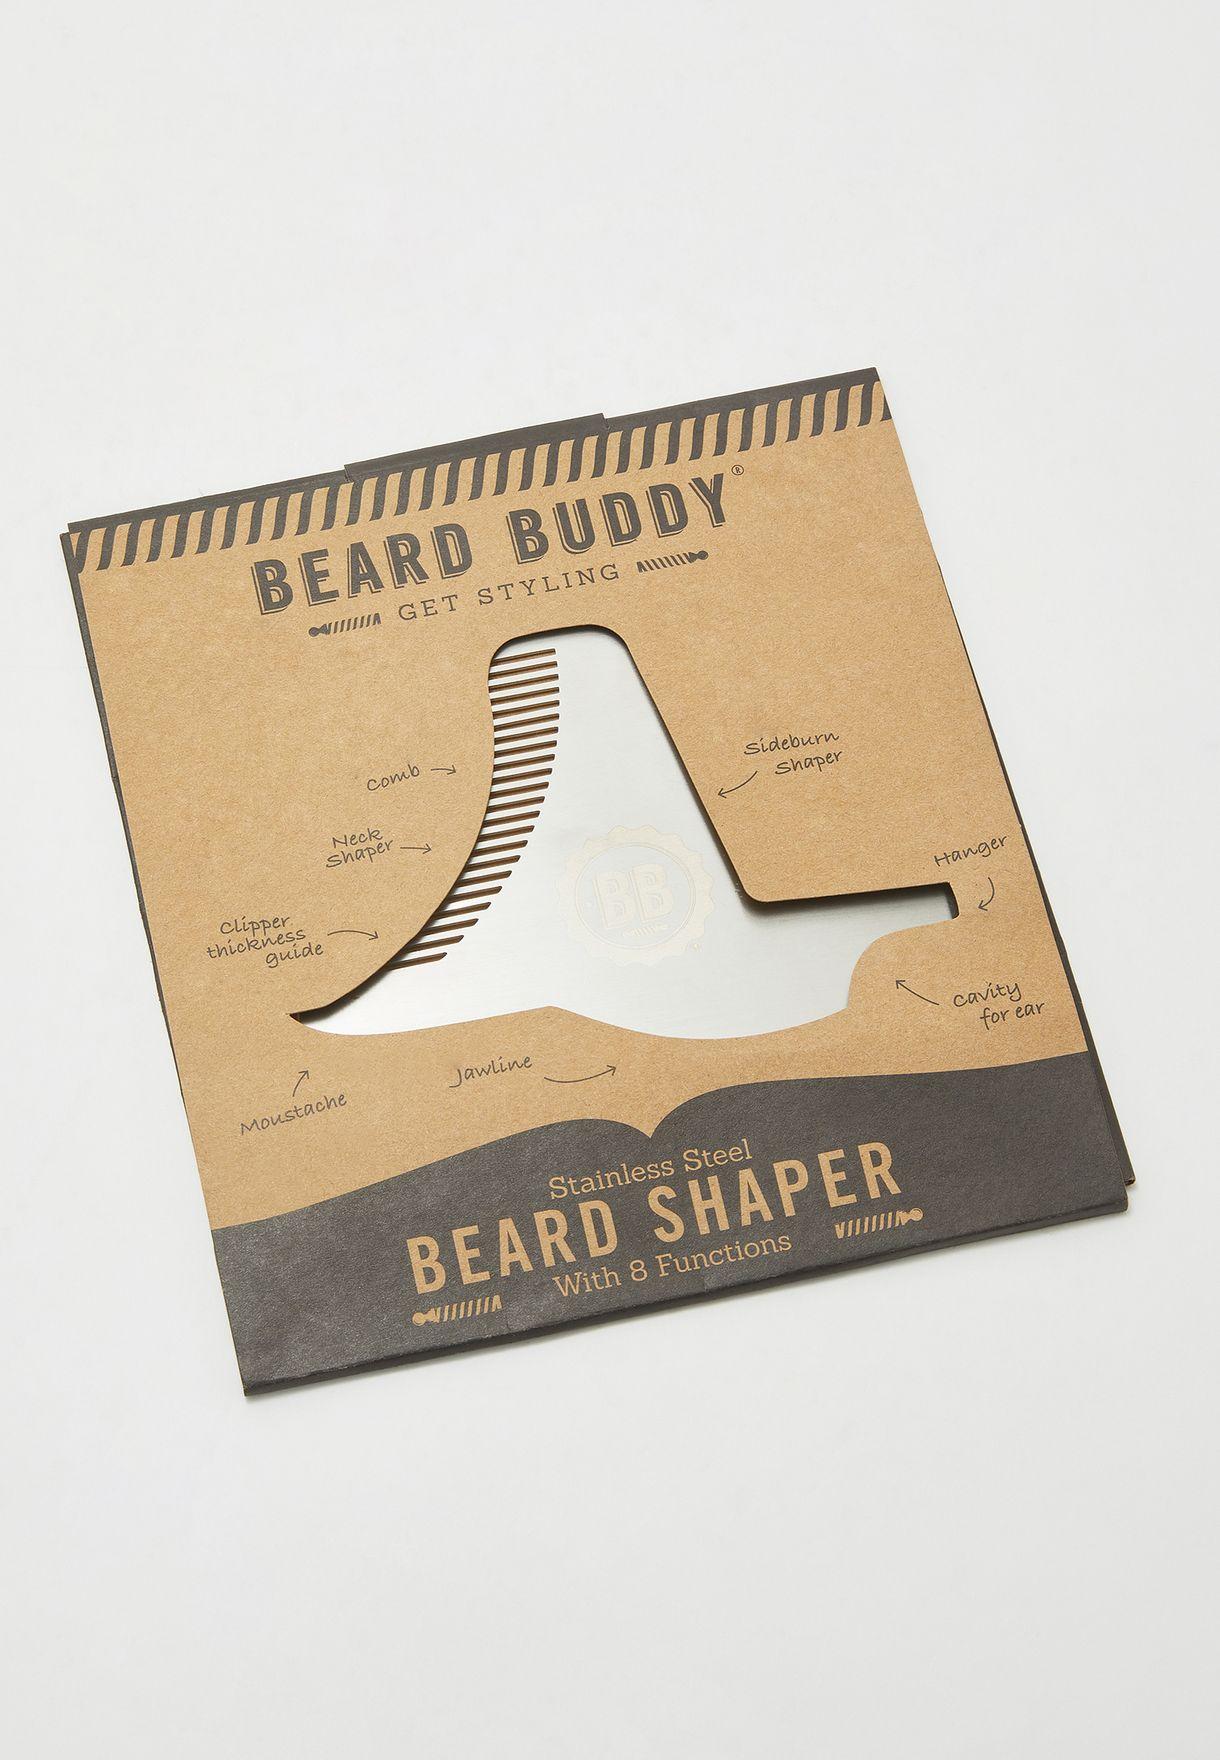 Beard Buddy Shaping Tool